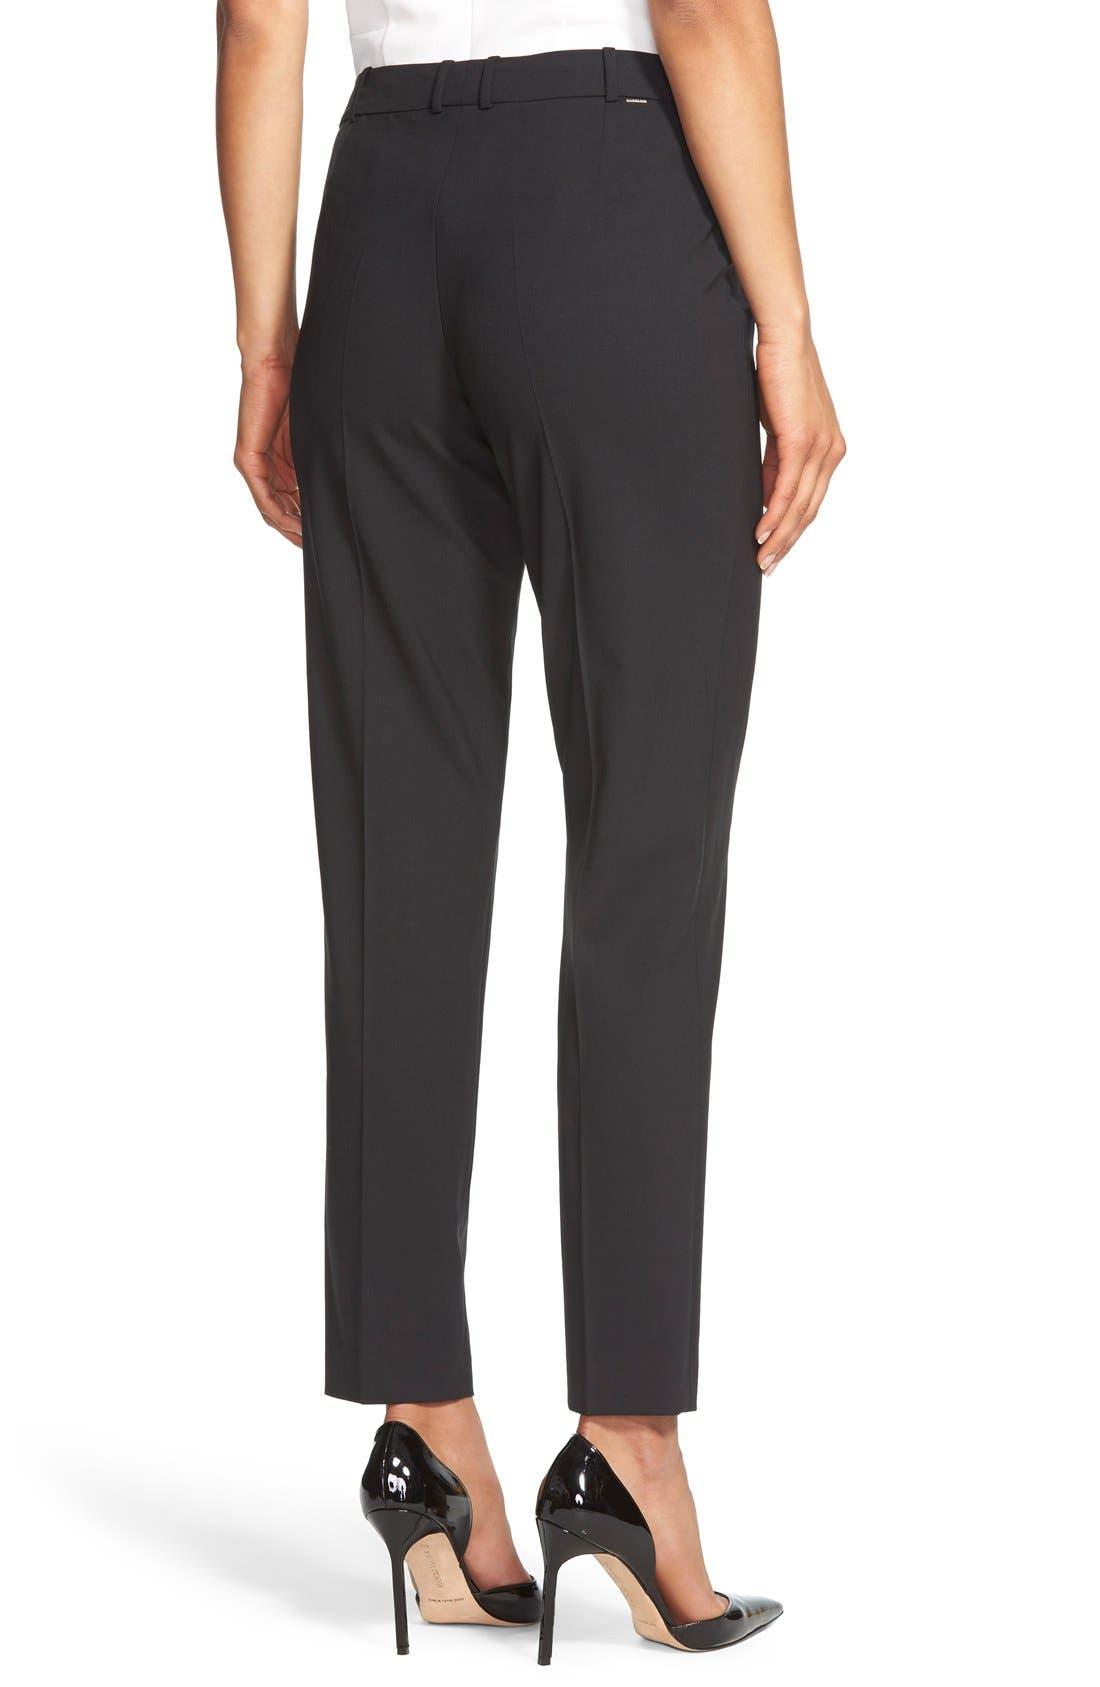 Tiluna Tropical Stretch Wool Ankle Trousers,                             Alternate thumbnail 4, color,                             BLACK